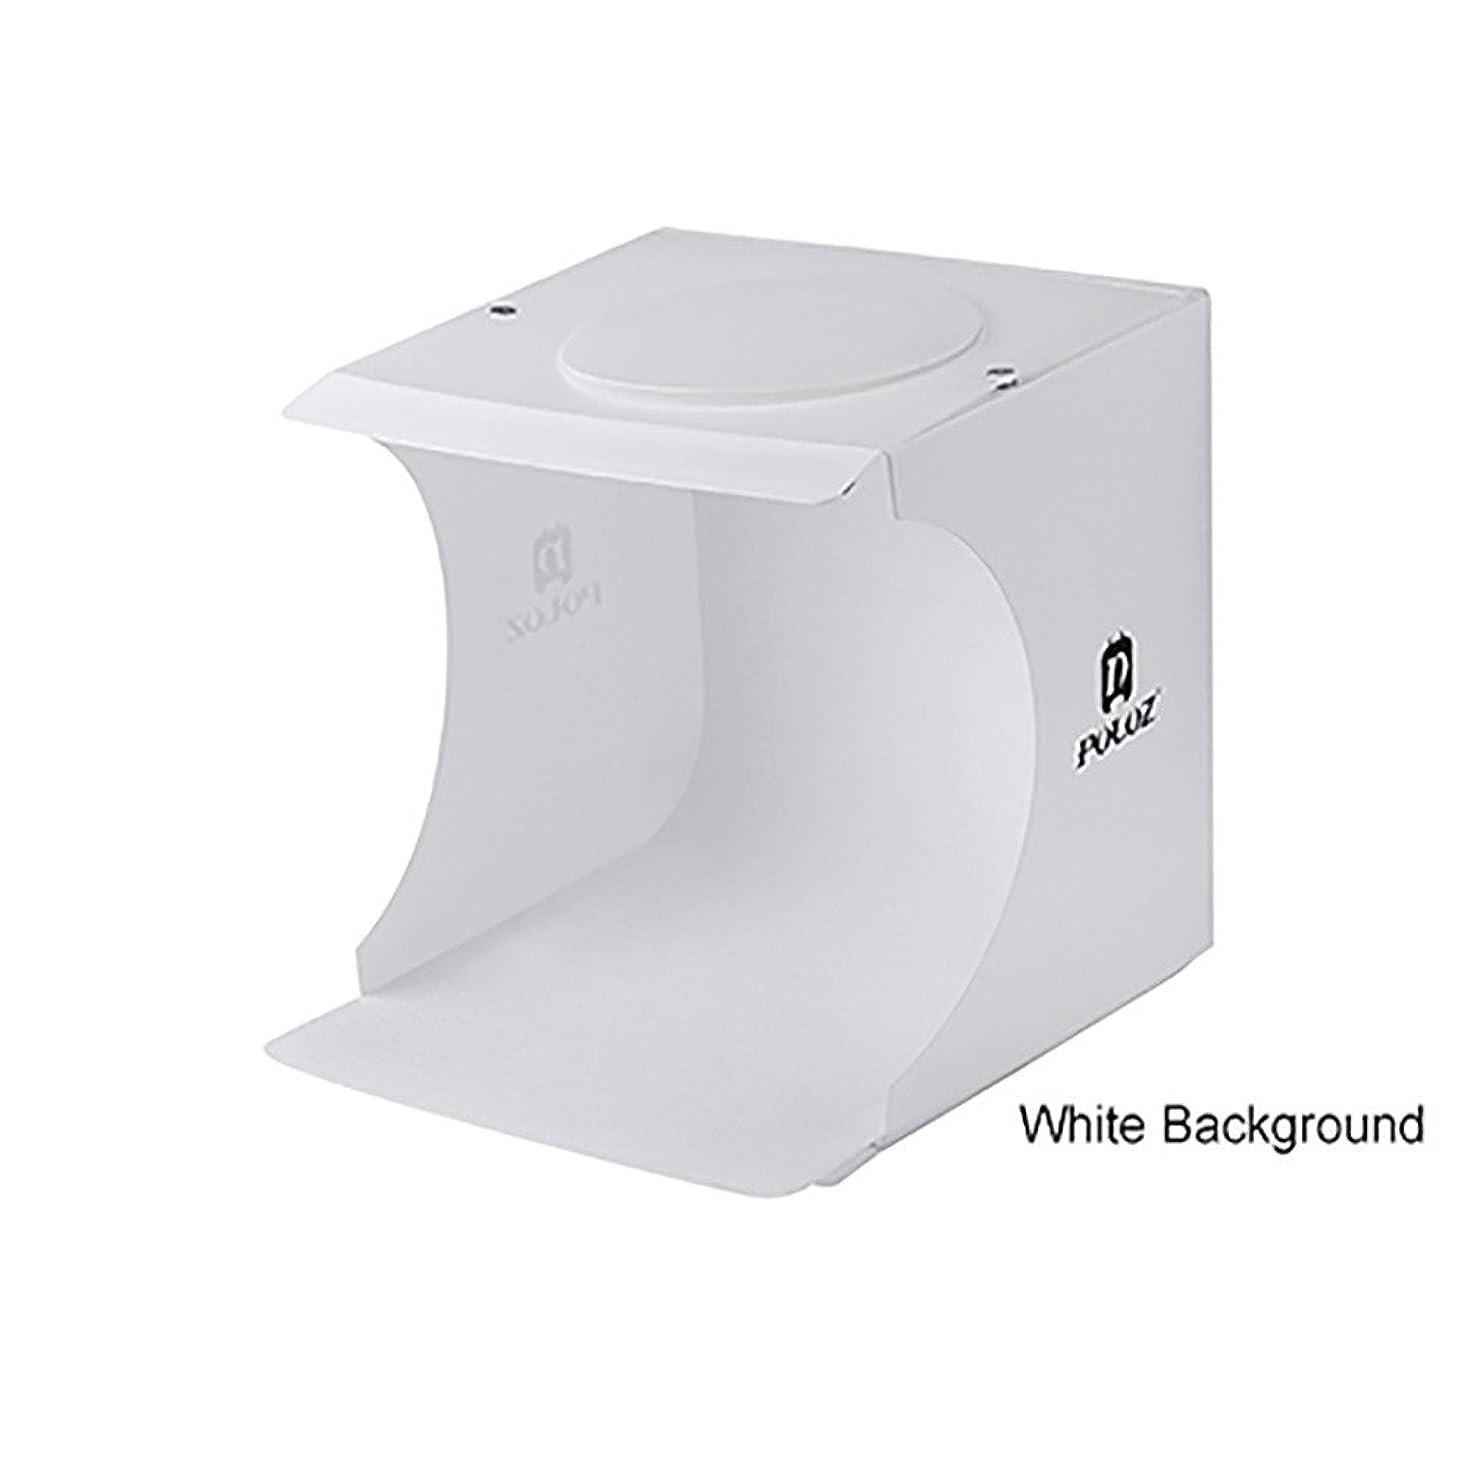 HOUSINGLOVES Mini LED Light Room Photo Studio Photography Lighting Tent Backdrop Cube Box